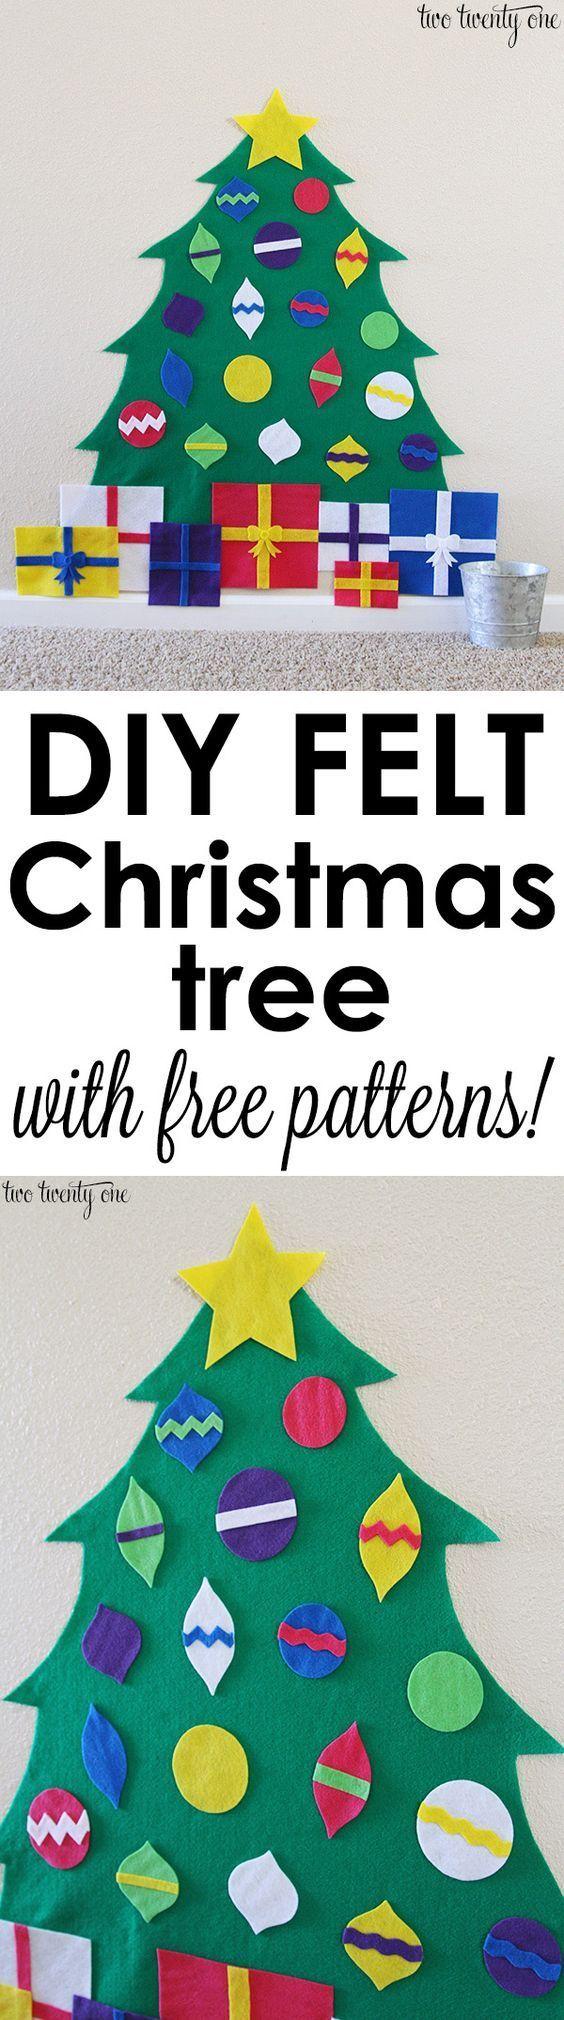 How to make a felt Christmas tree! Plus, free patterns!